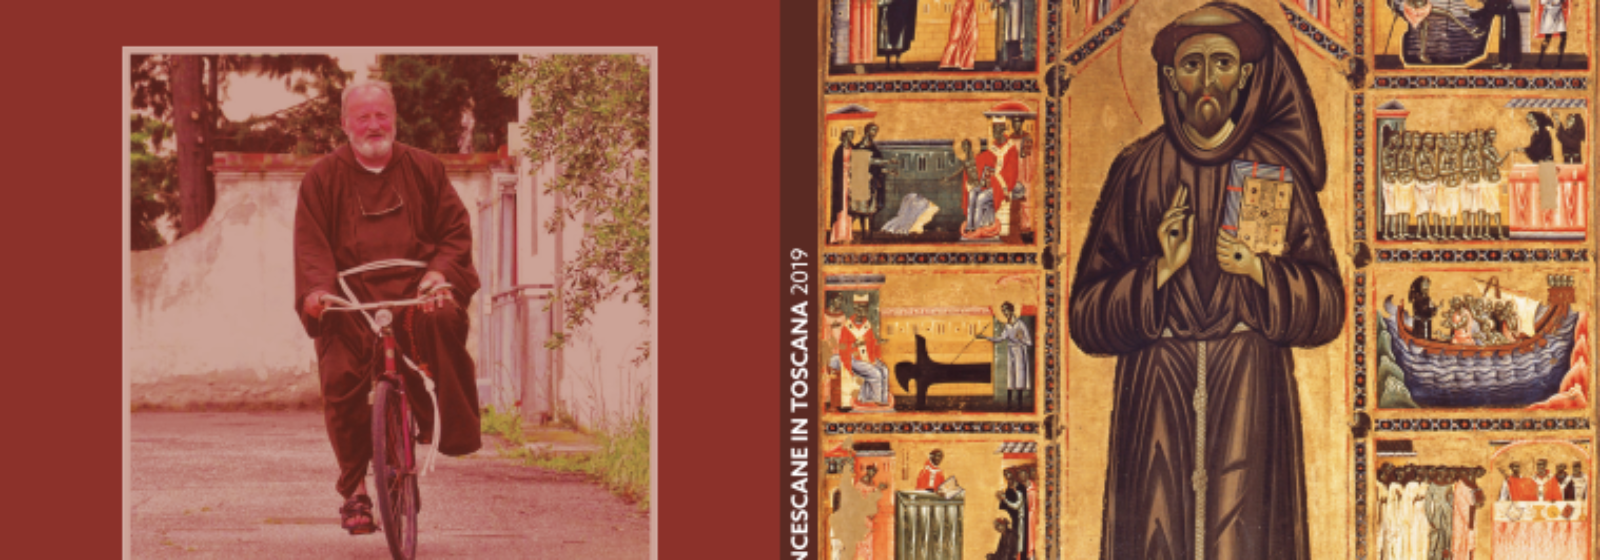 In un libro le presenza francescane in Toscana